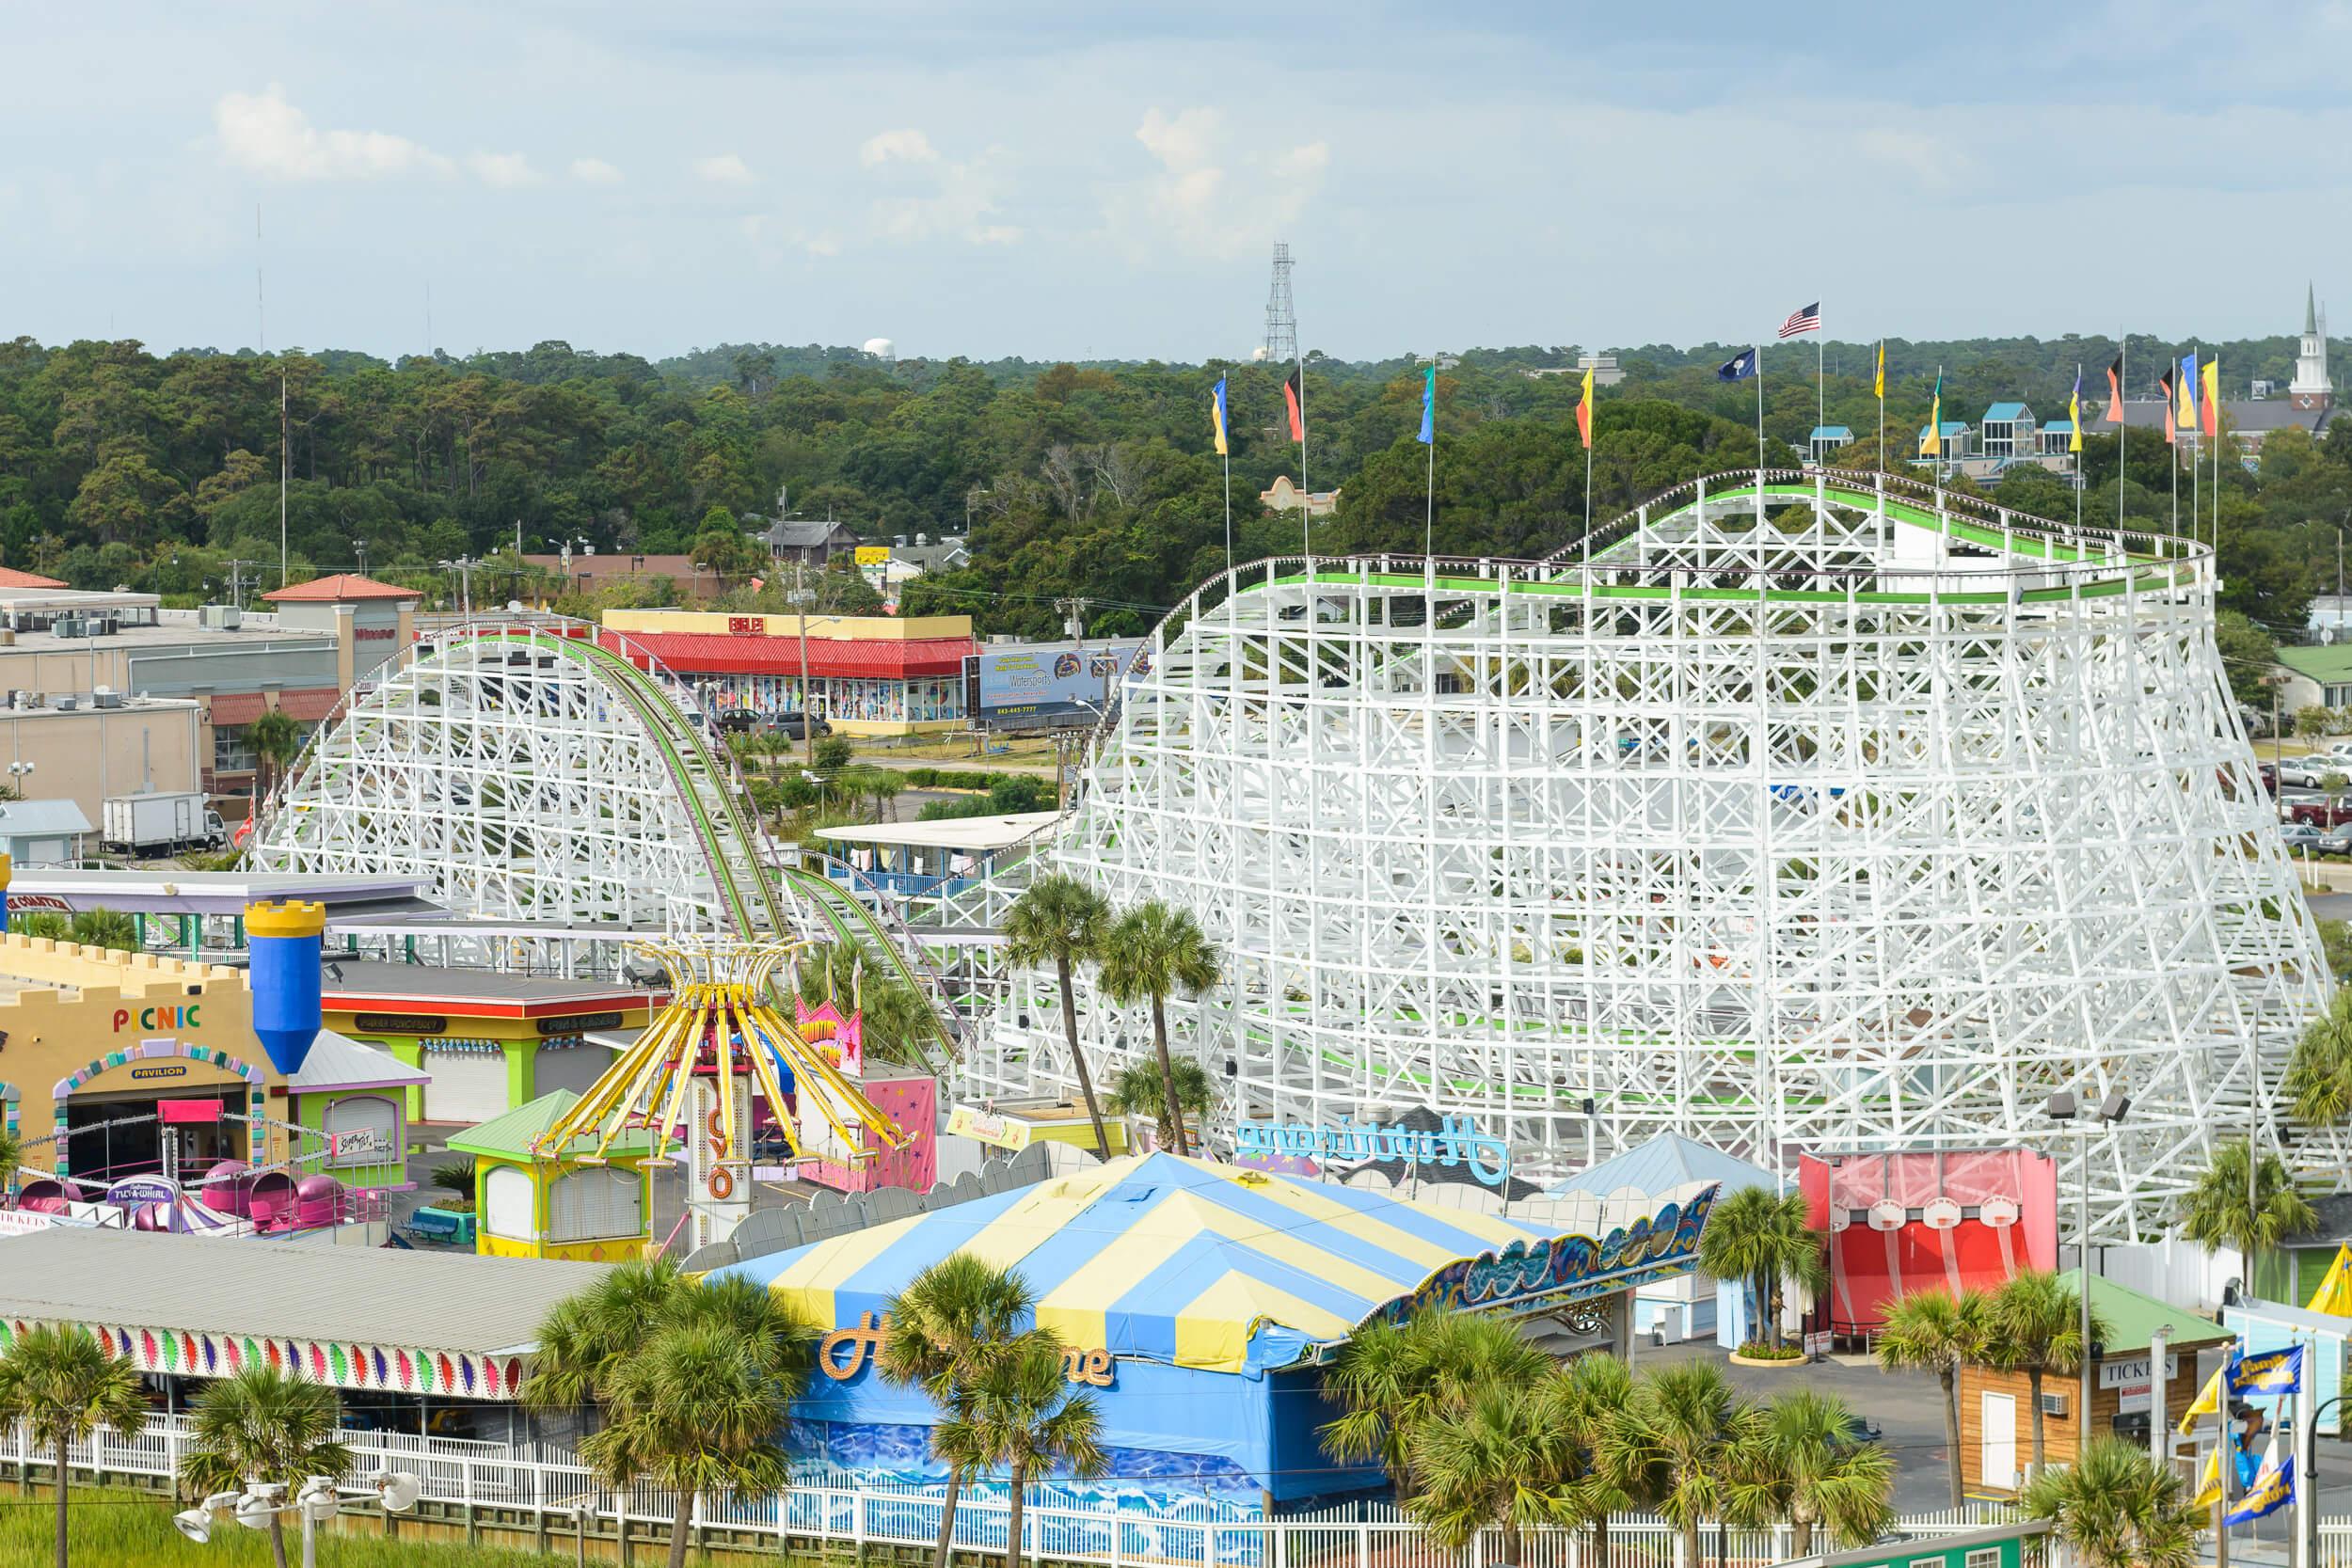 Amusement Park near our Myrtle Beach Resorts | Westgate Myrtle Beach Oceanfront Resort | Westgate Resorts